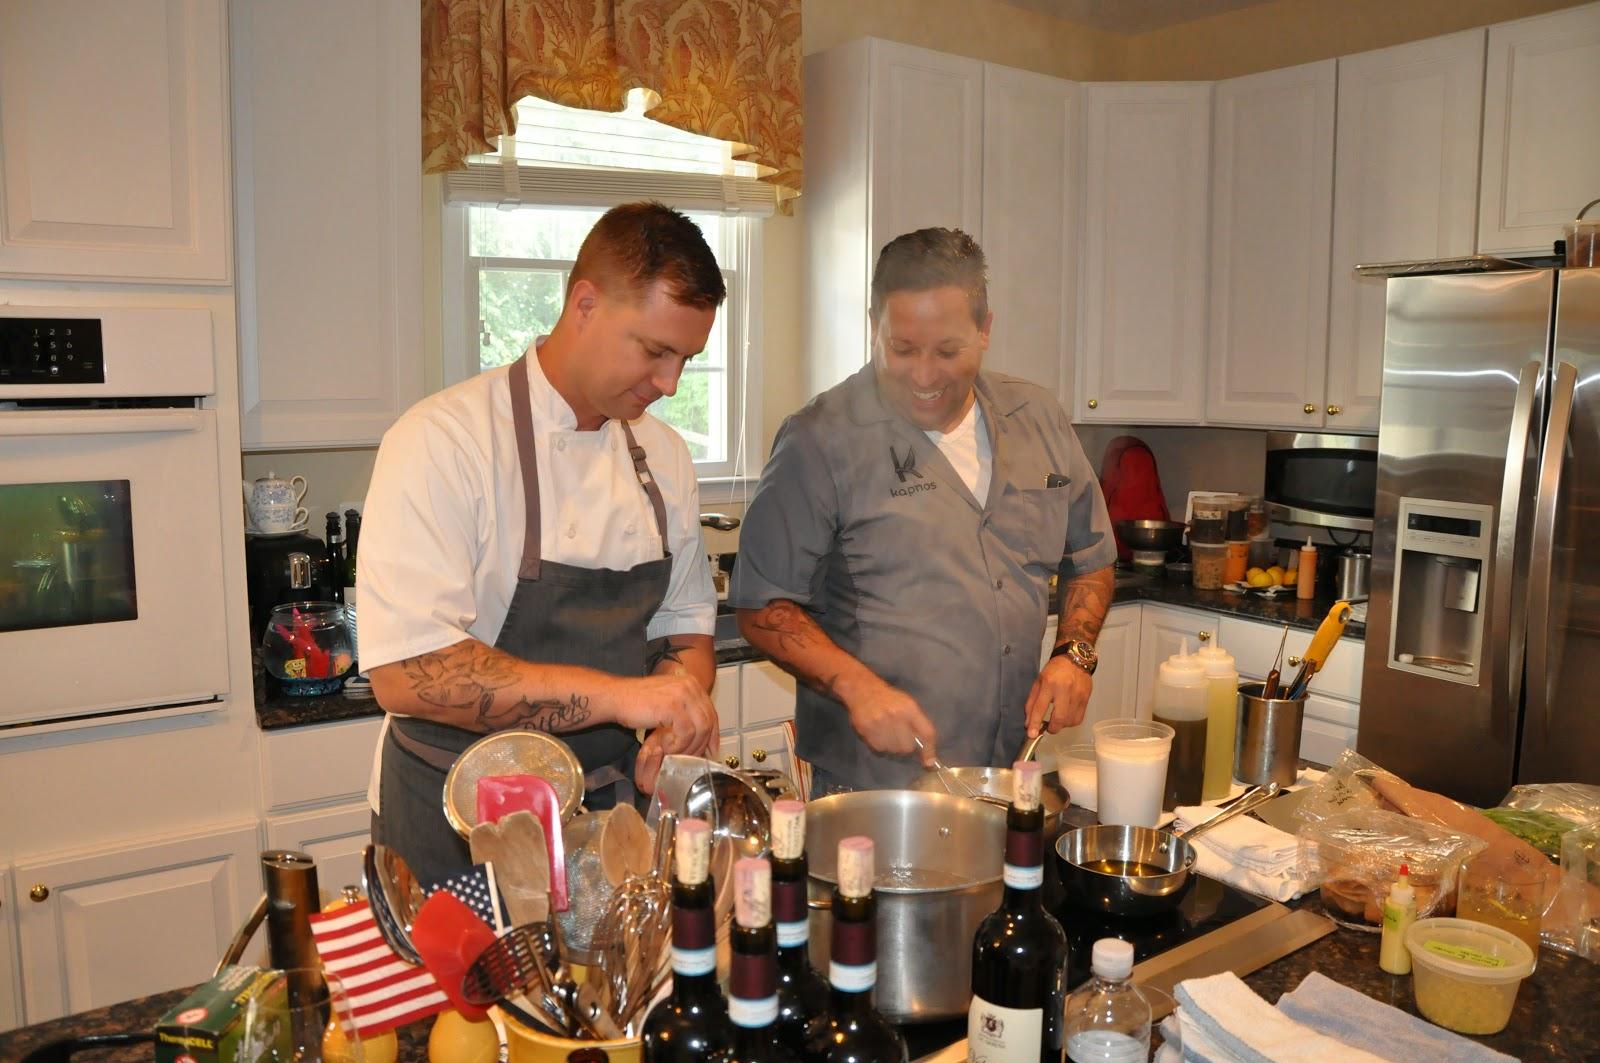 Mike Isabella and Bryan Voltaggio